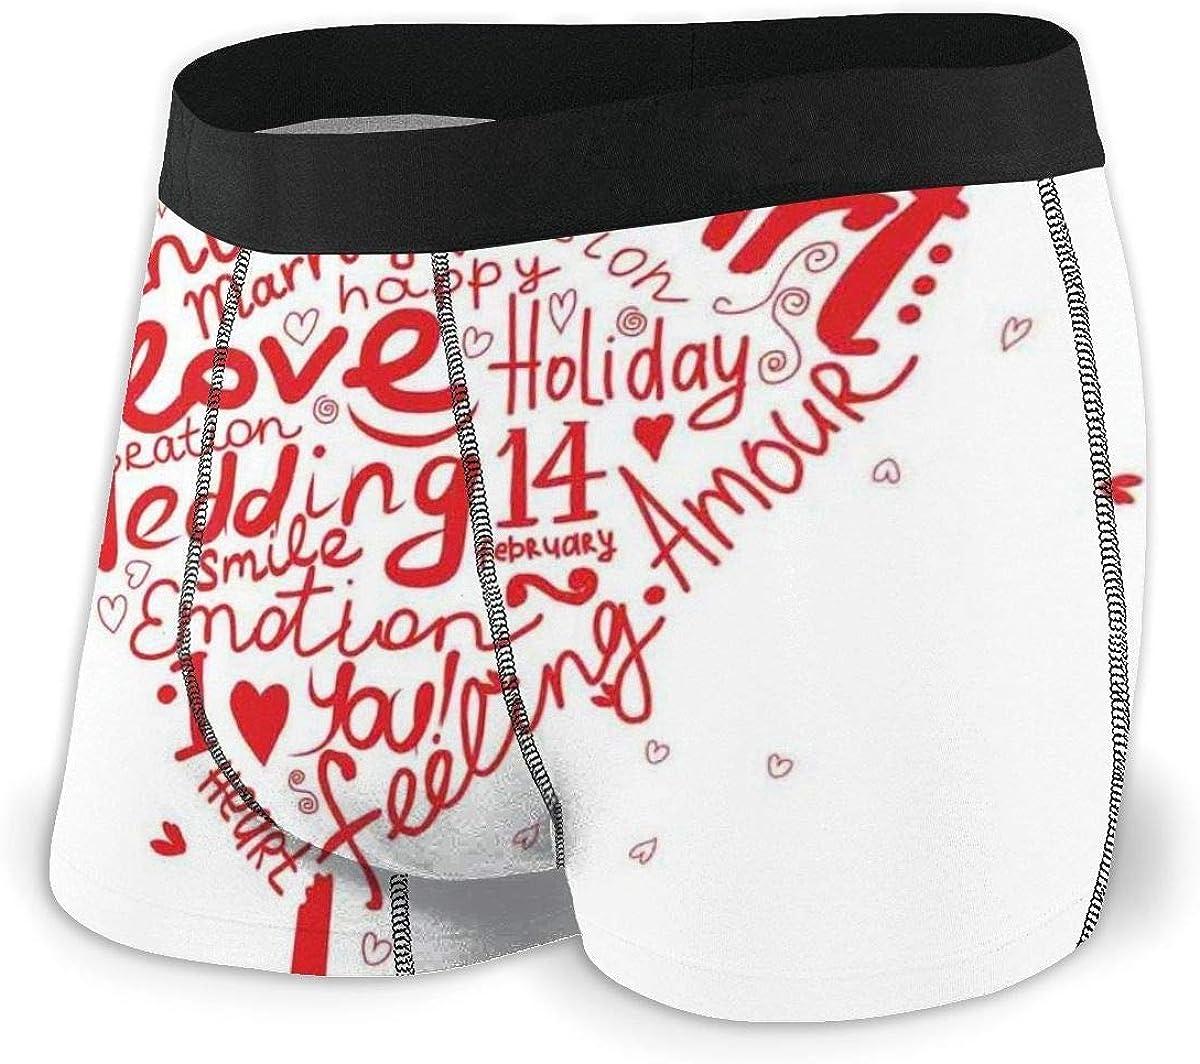 Web--ster Calzoncillos bóxer para Hombre Ropa Interior, Gotas de Lluvia en Forma de corazón en Cristal Transparente Cristal de la Ventana Amor Puro San Valentín Talla L